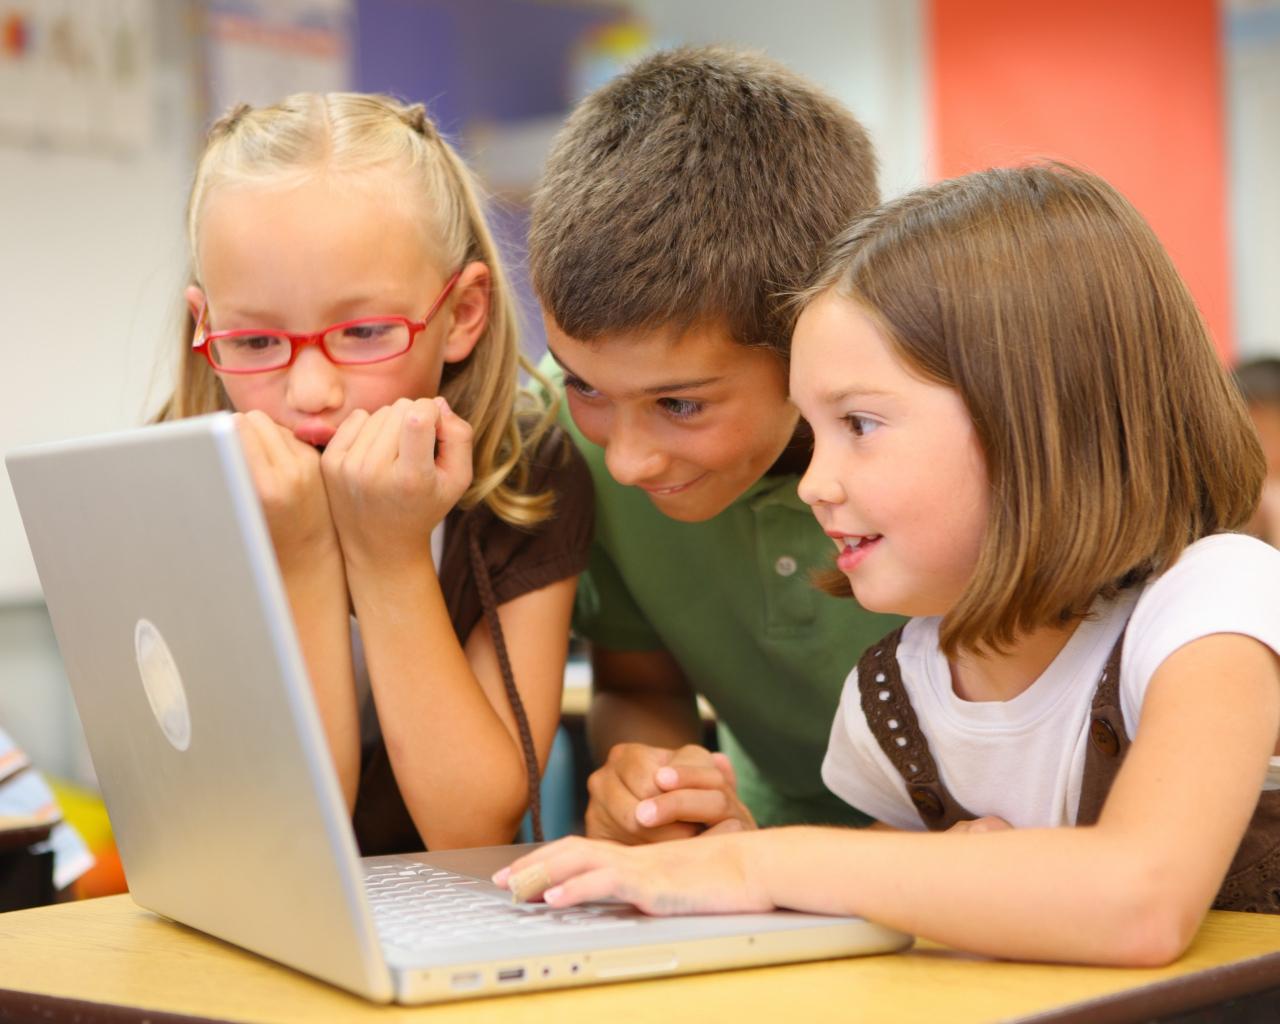 children_school_desk_laptop_80192_1280x1024